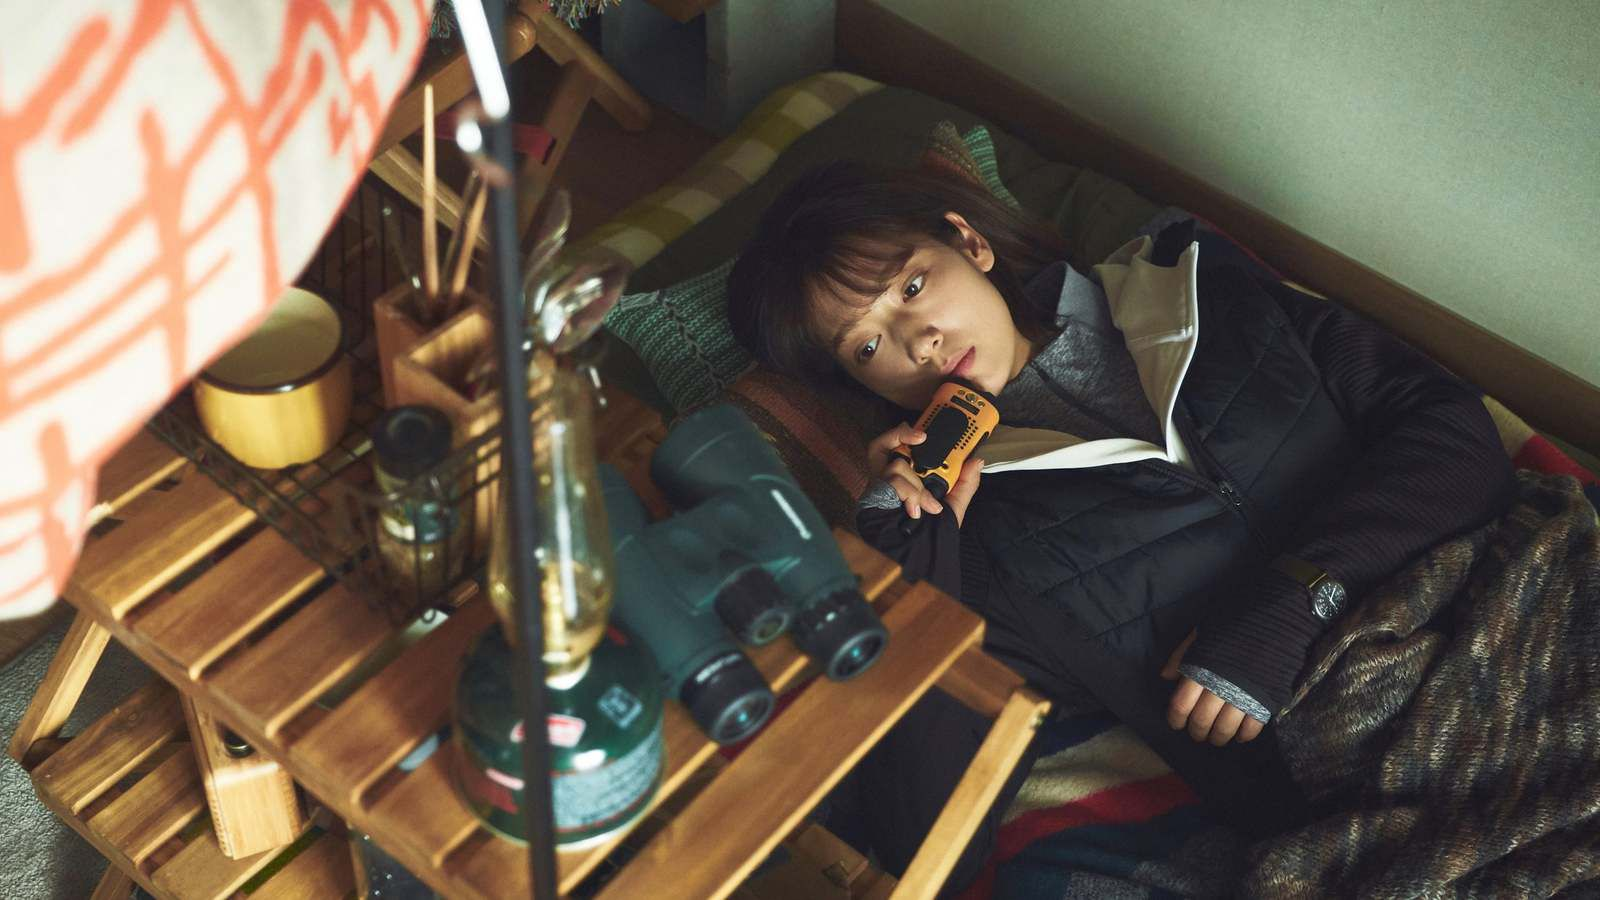 Review Korea S Alive Is A Perfect Zombie Movie For The Coronavirus Era Cinema Escapist